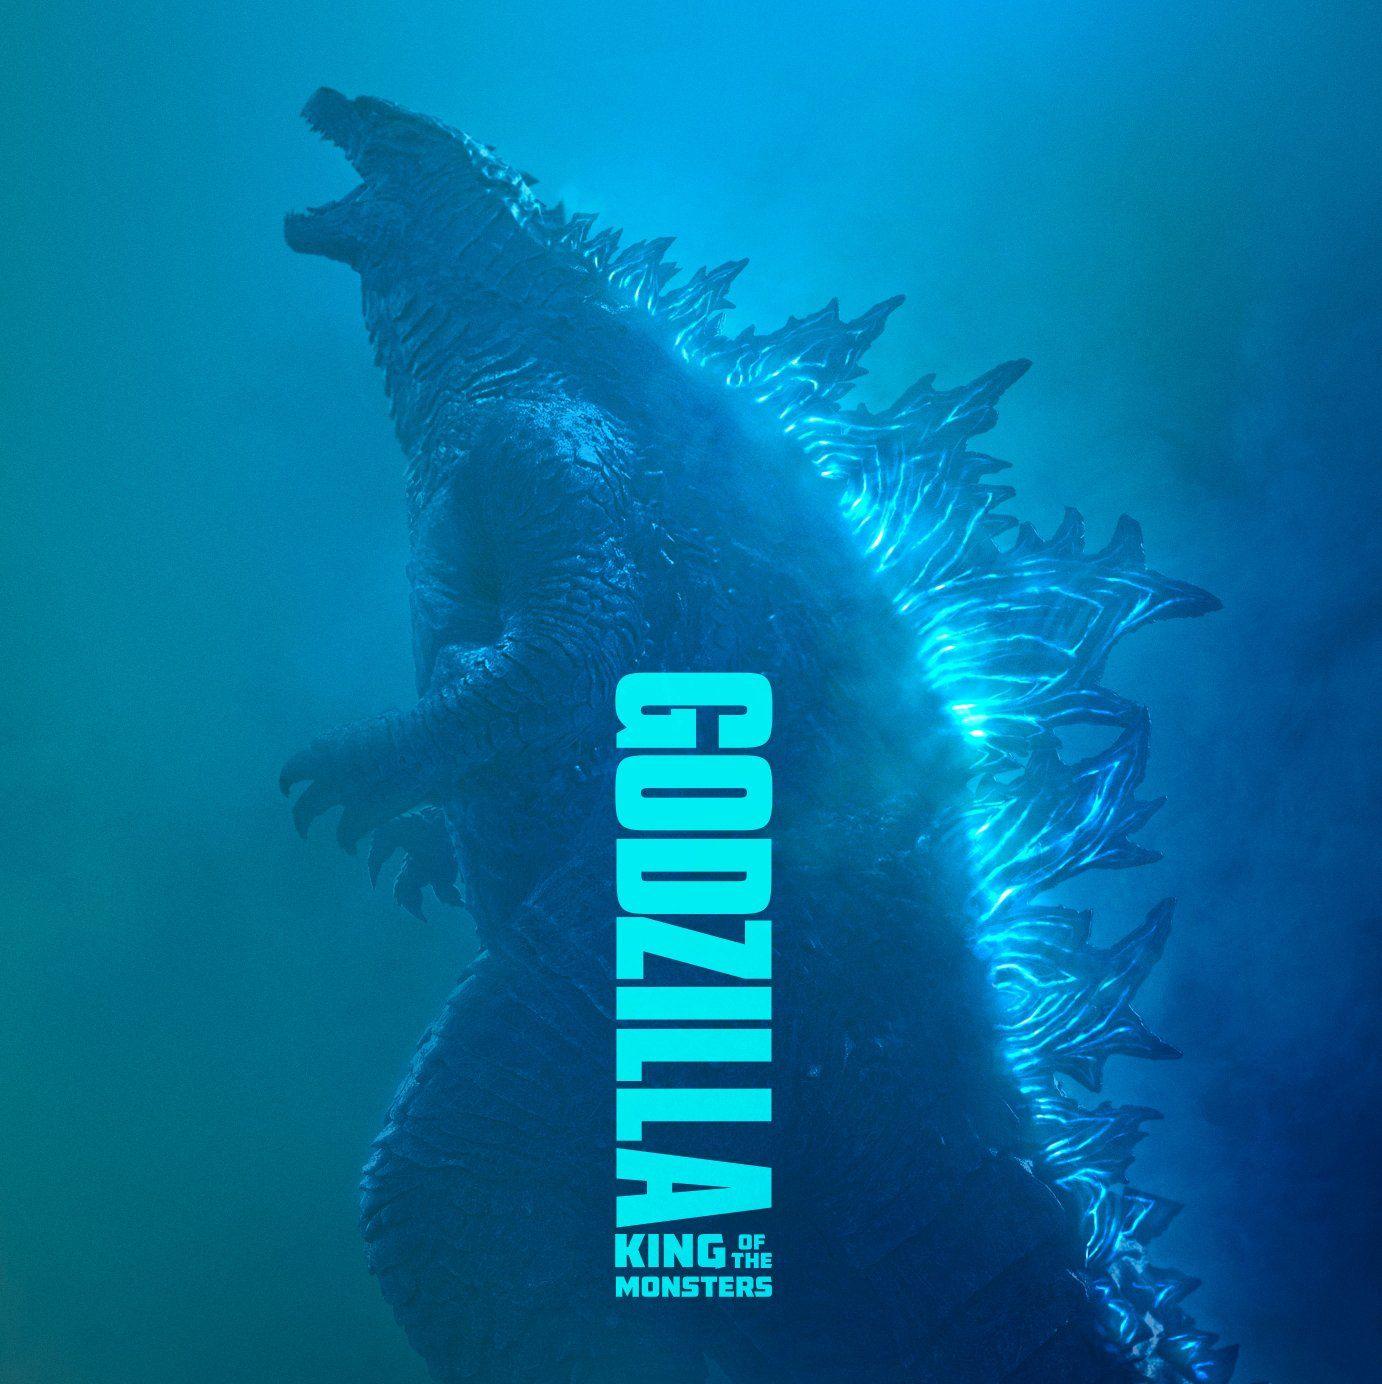 Godzilla vs Kong will battle in cinemas sooner than expected